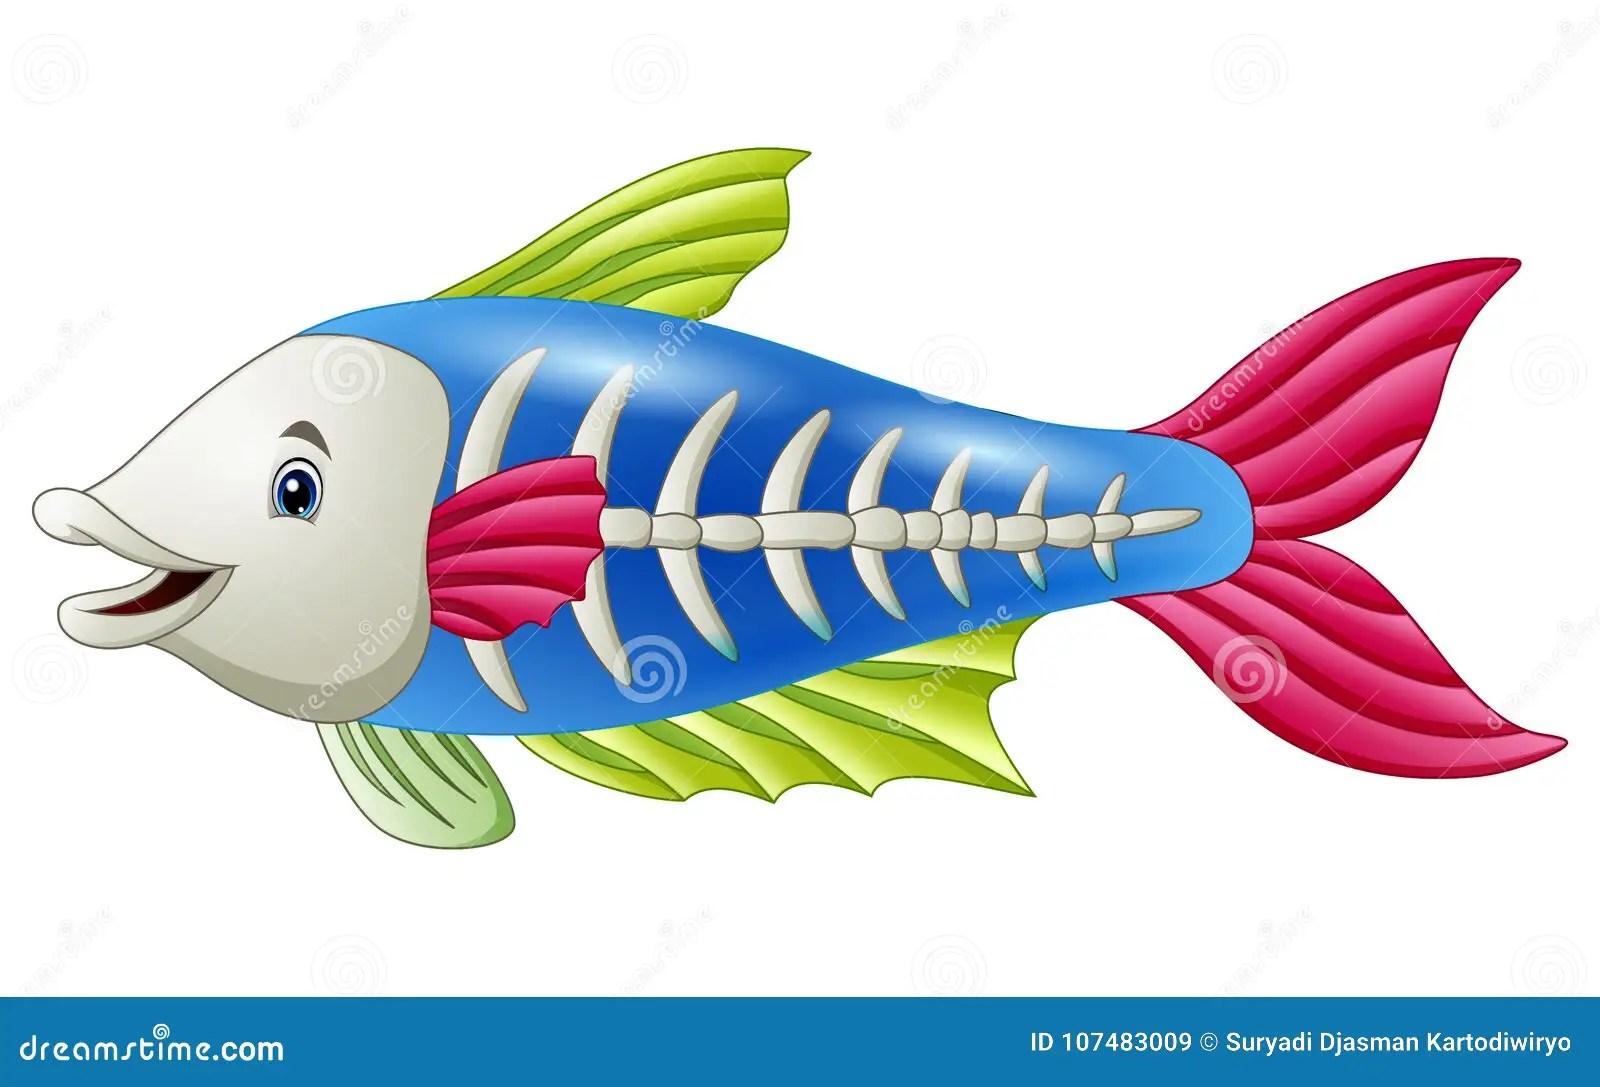 Cute X Ray Fish Cartoon Stock Vector Illustration Of